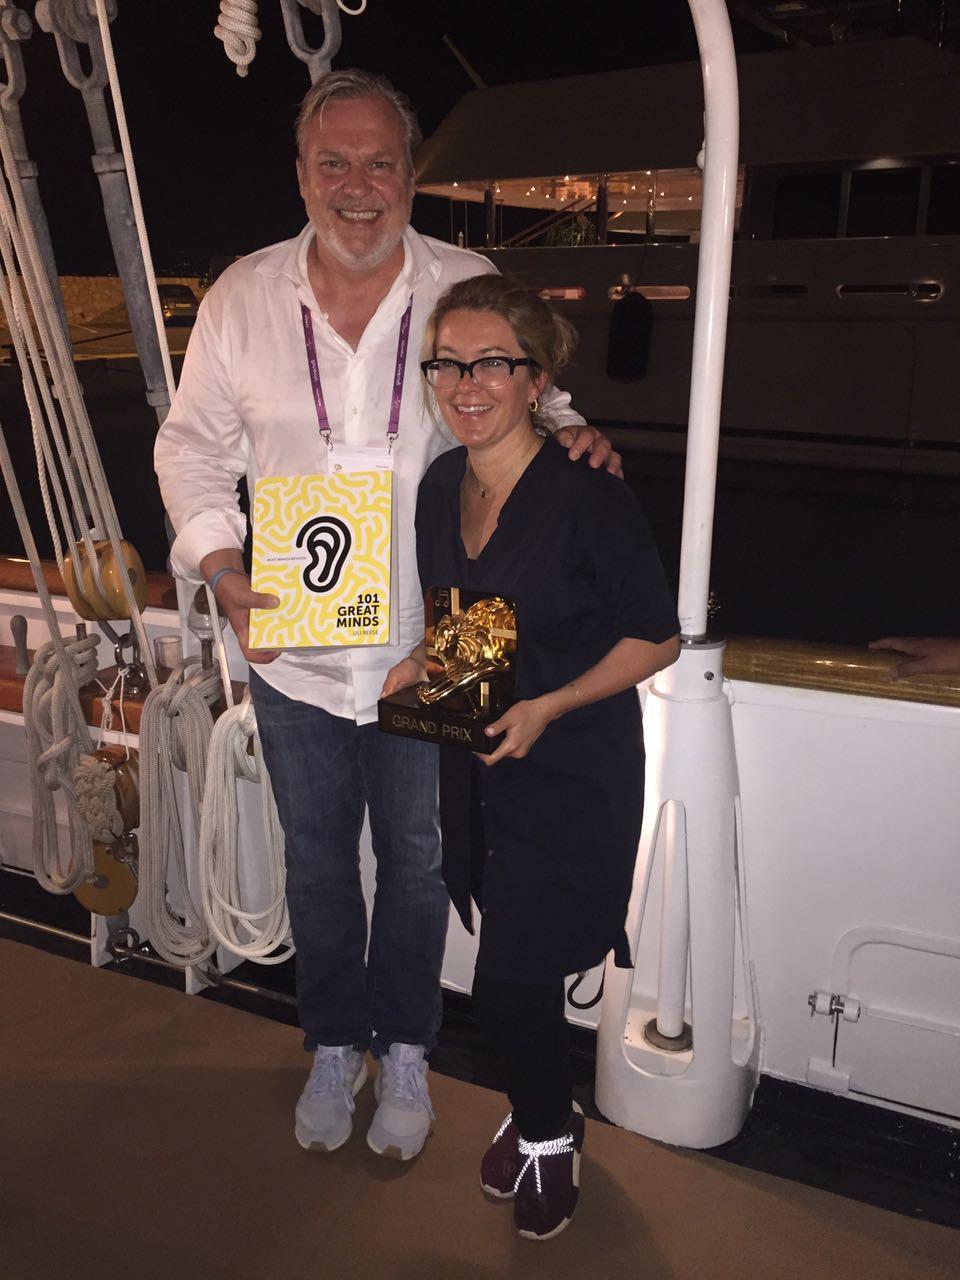 Uli & Alegra at the 2017 Cannes Lions Festival of Creativity.